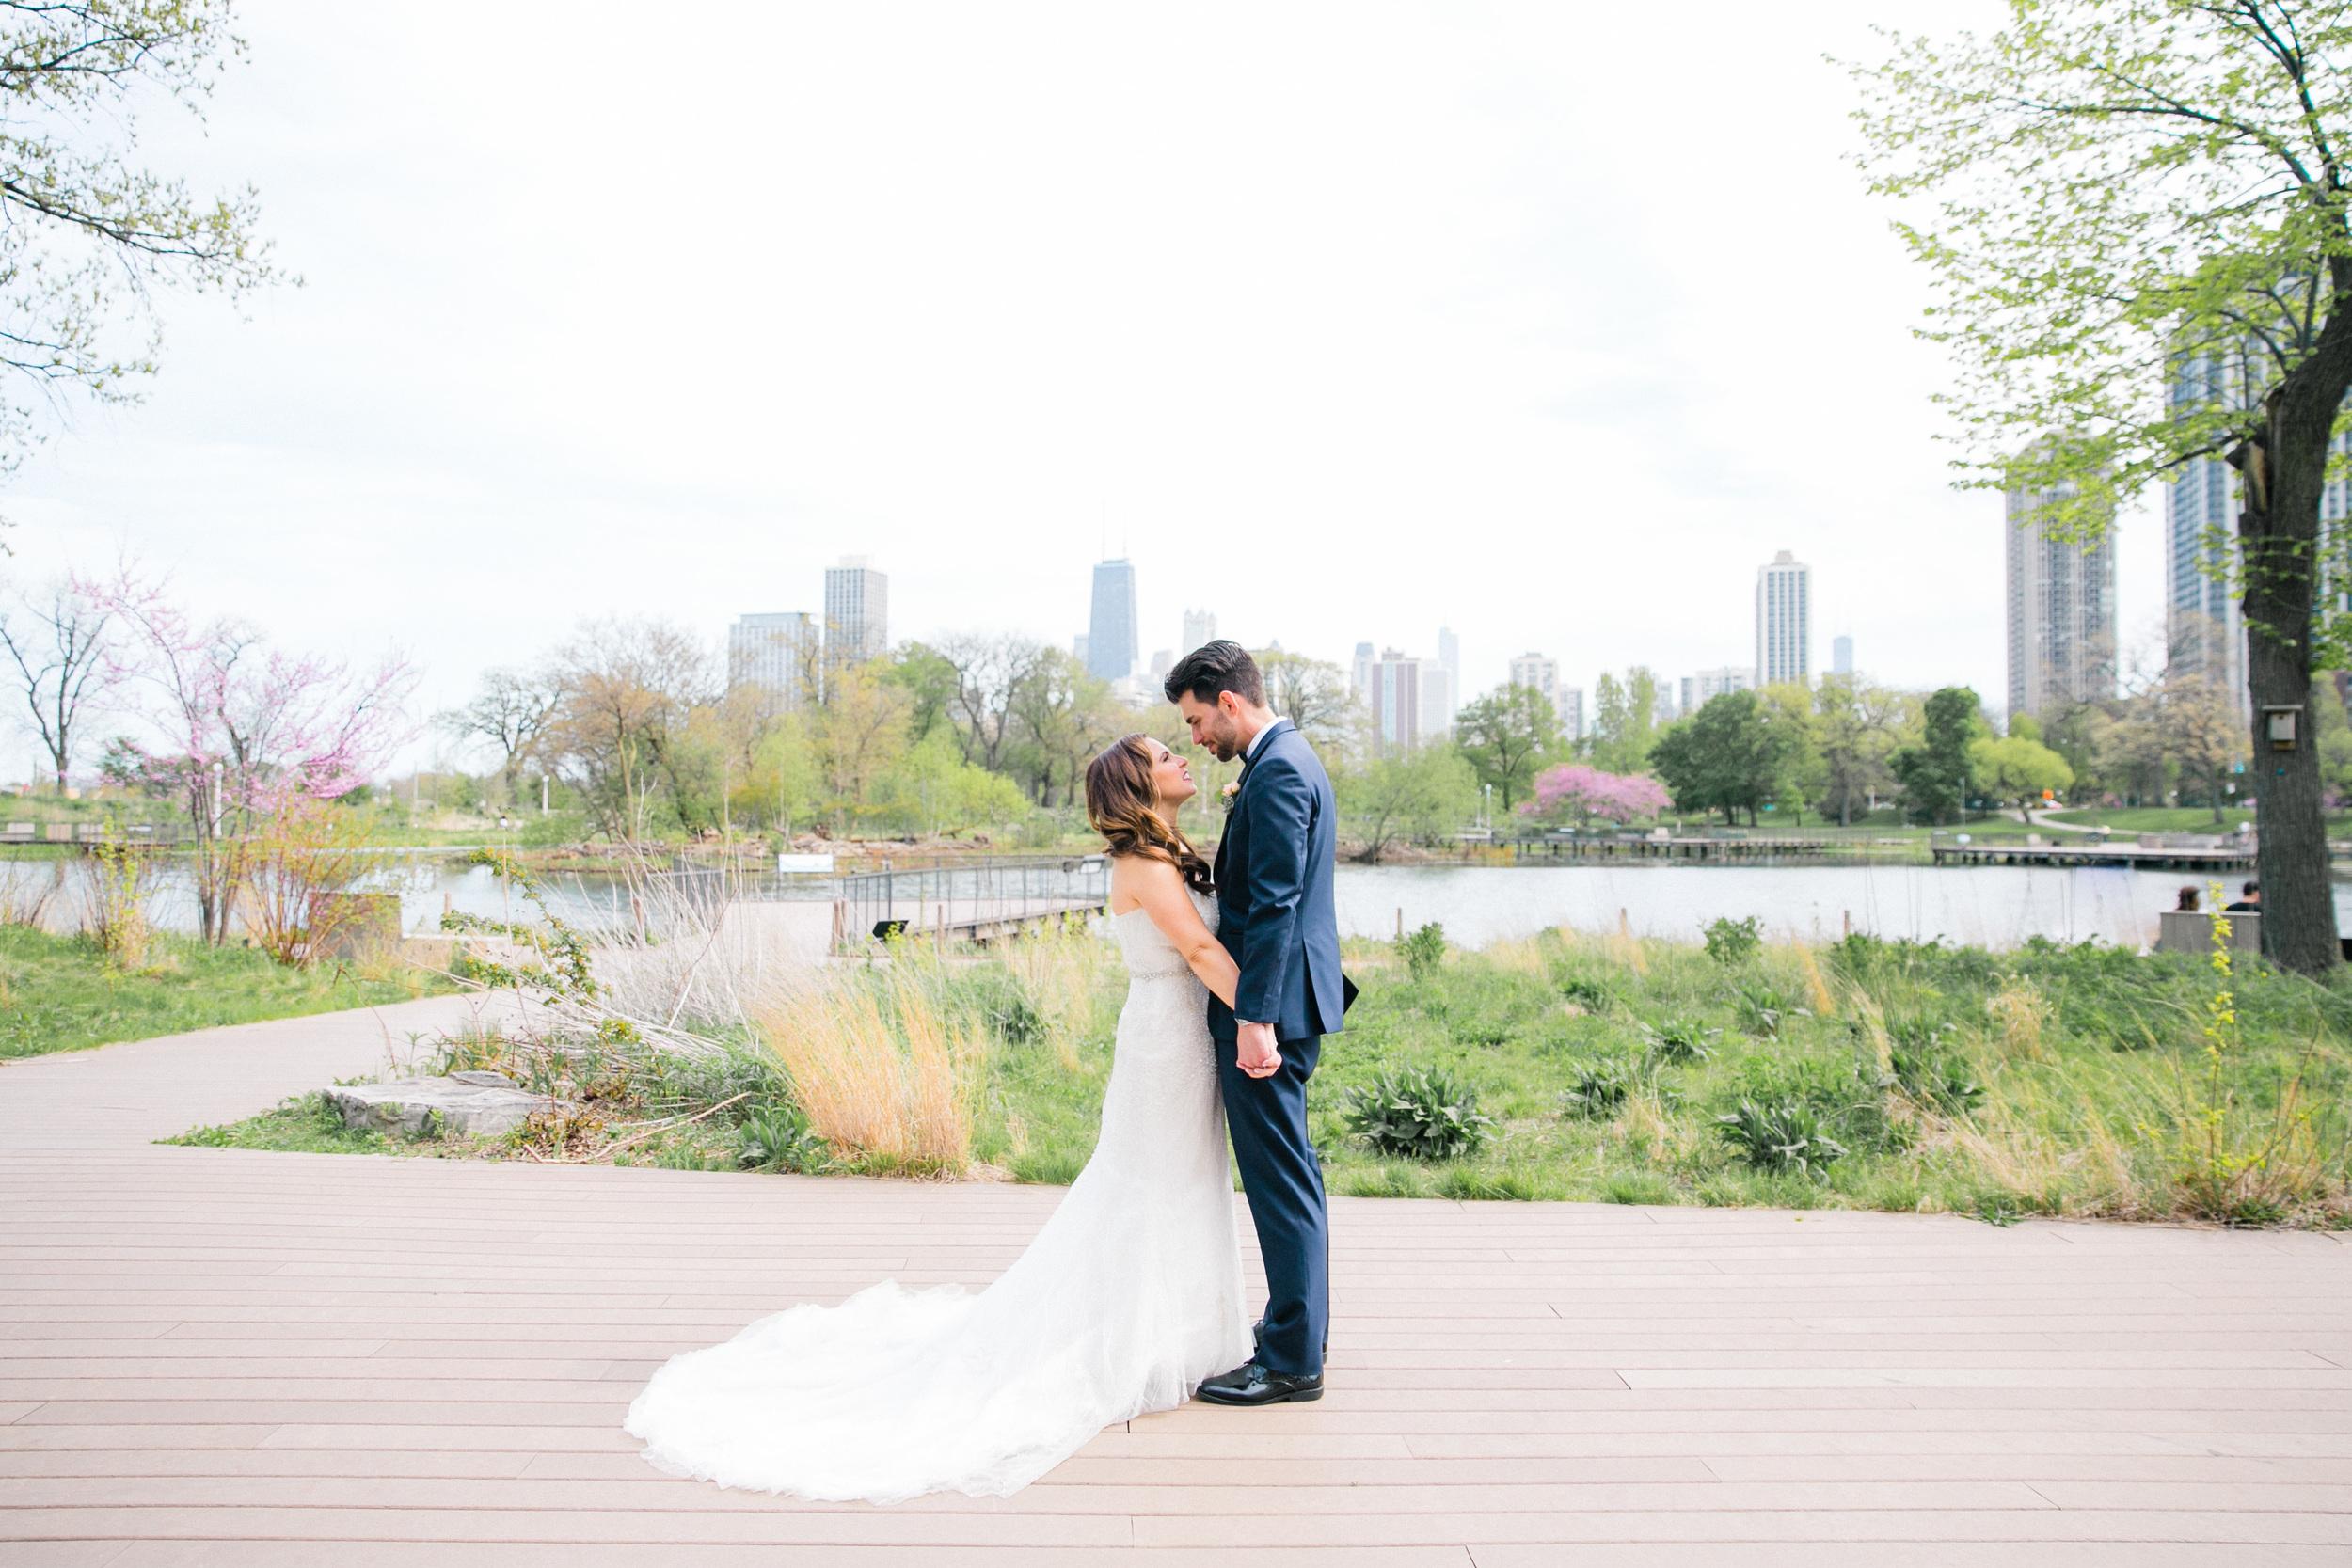 mayden_photography_weddings-70.jpg